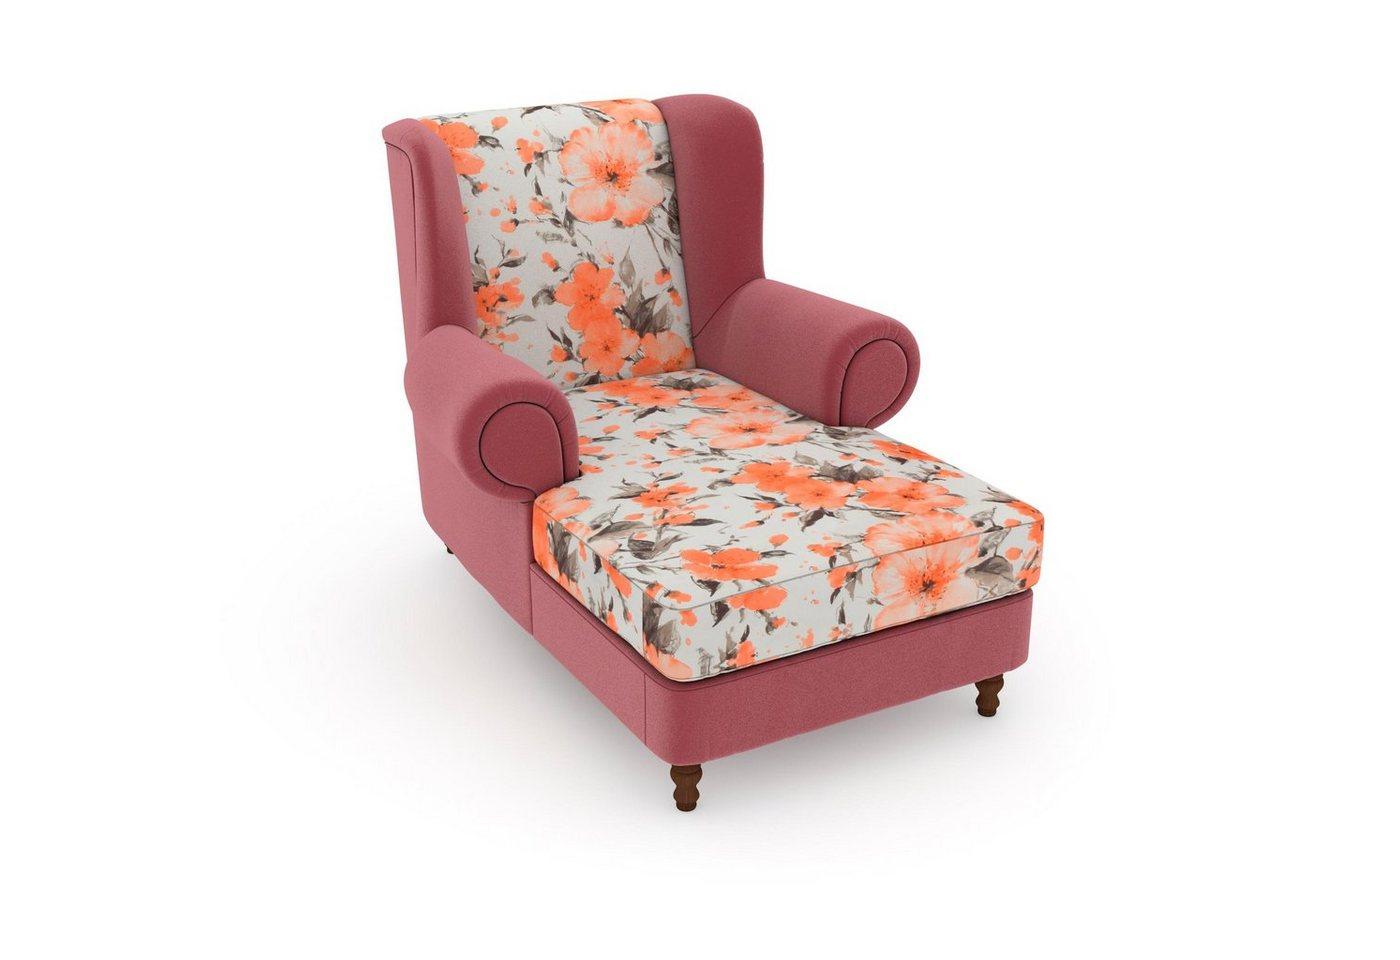 MAX WINZER® build-a-chair XXL oorfauteuil Madeleine, om zelf te stylen